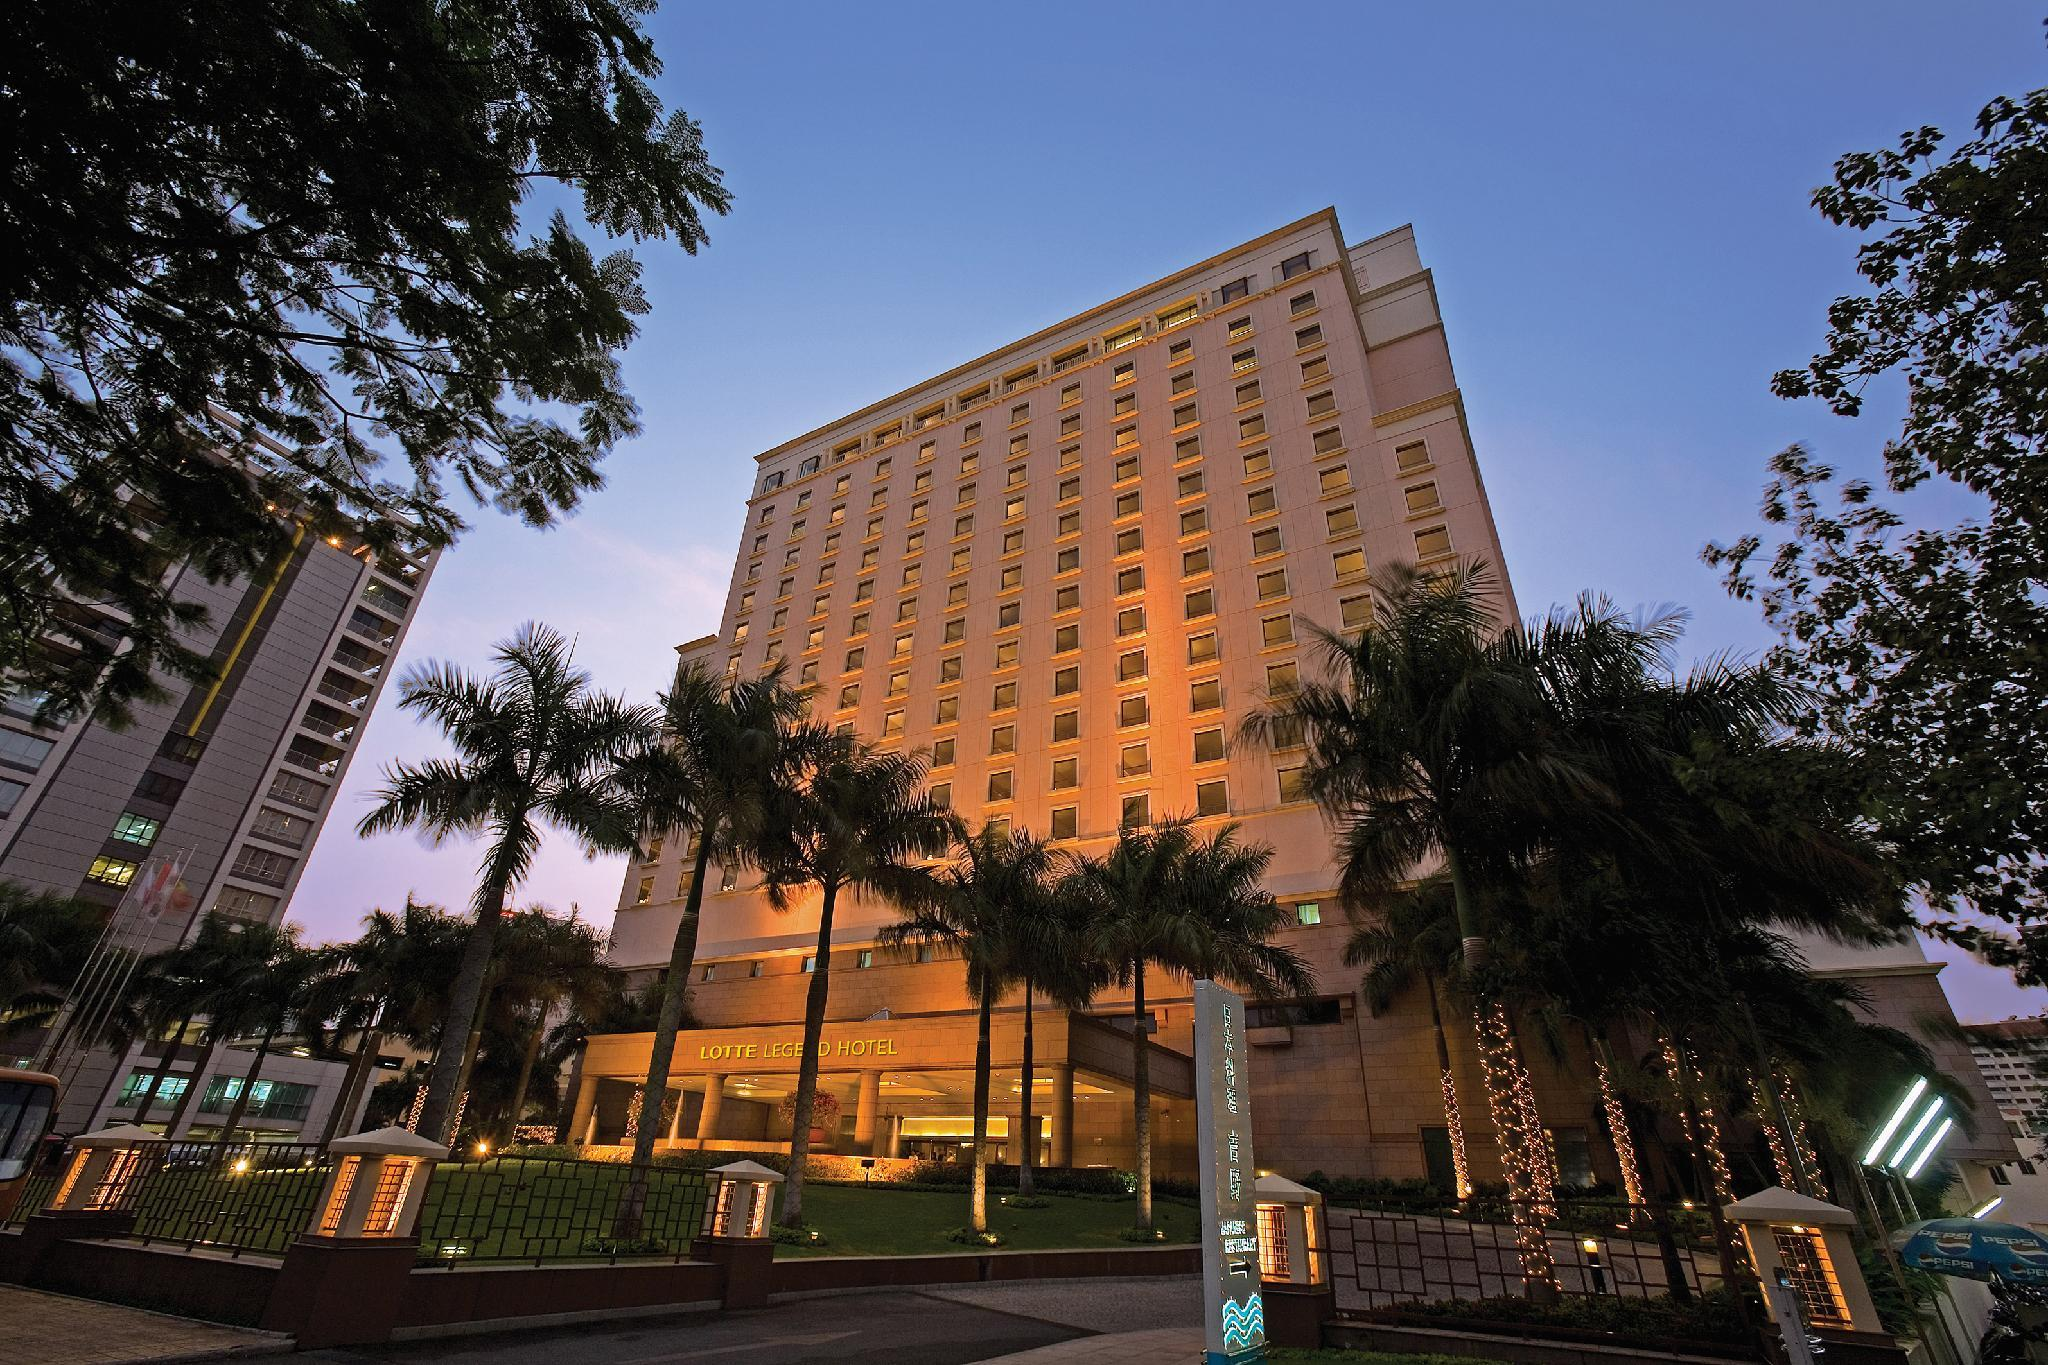 Khách Sạn Lotte Legend Hồ Chí Minh